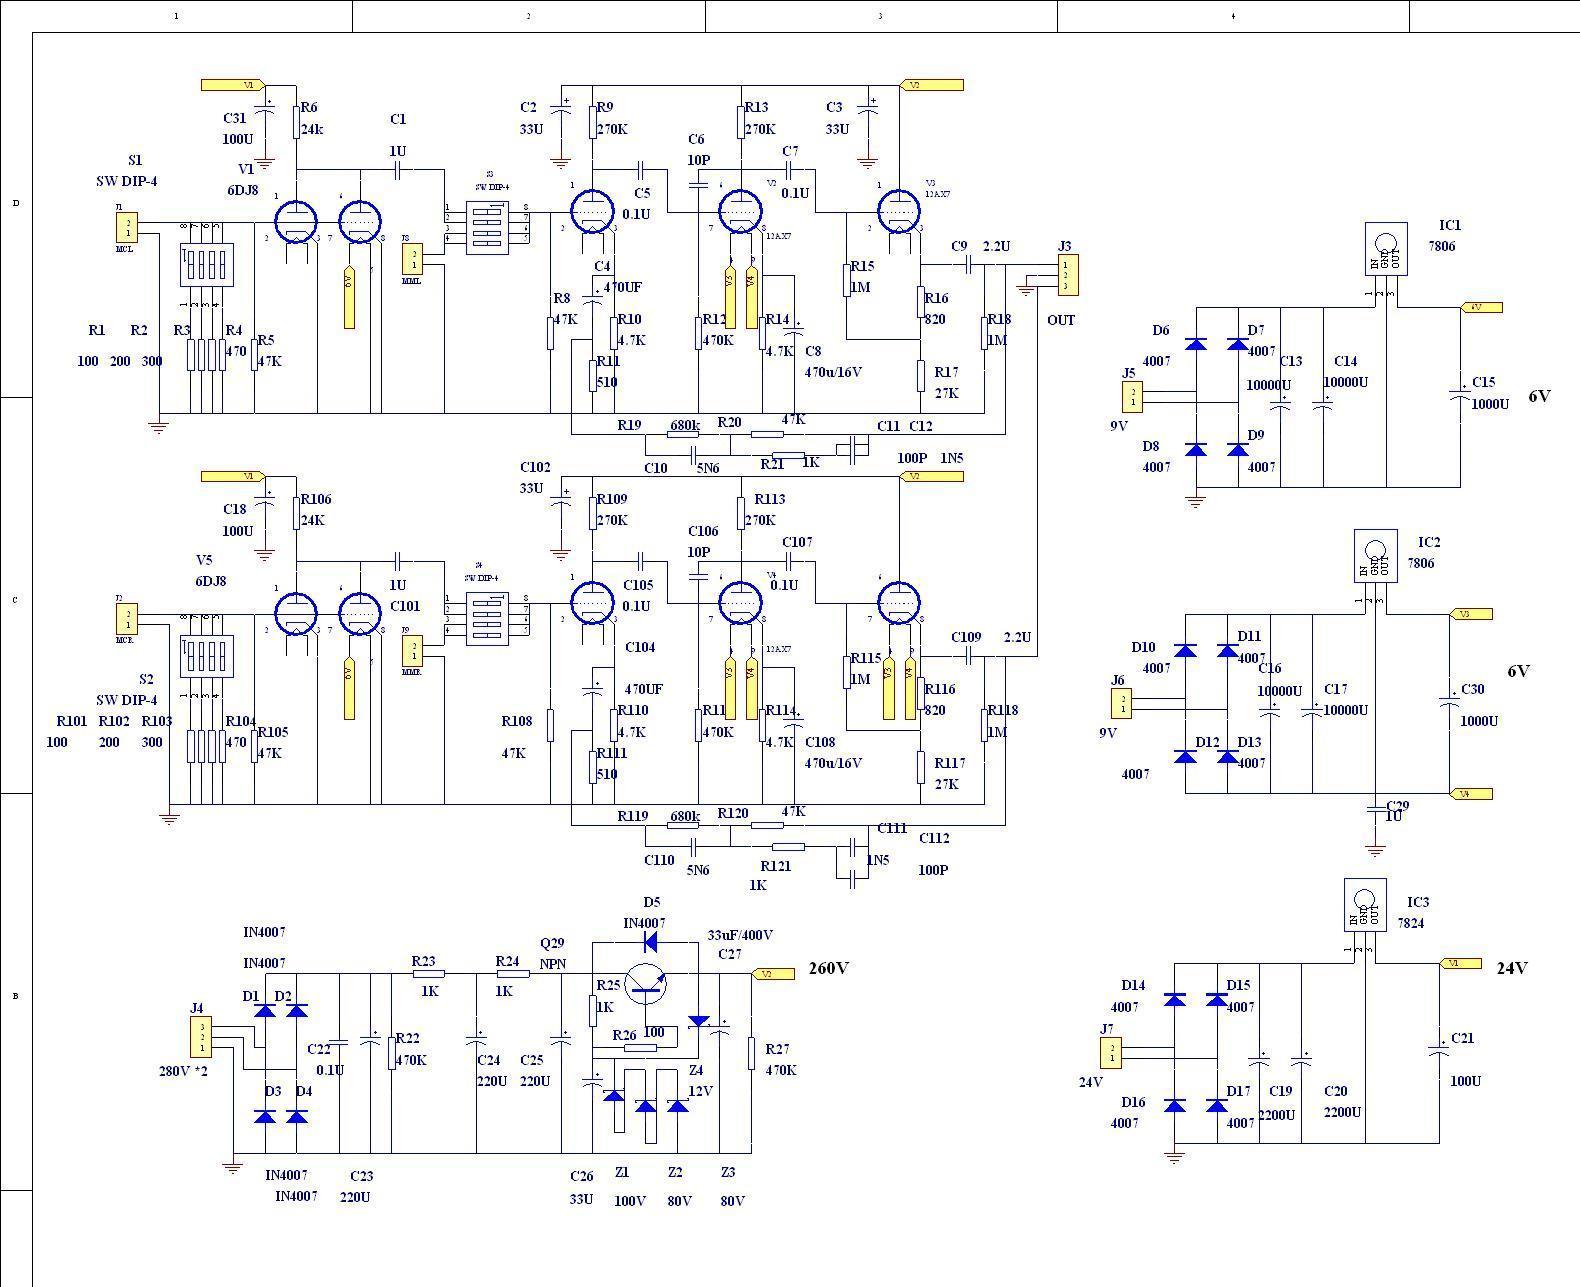 Marantz 7 Circuit Diagram | Wiring Liry on 150 cc engine wiring diagram, roketa 150 wiring diagram, hammerhead 150 engine, hammerhead 150 frame, honda 150 wiring diagram, trailmaster 150 wiring diagram, talon 150 wiring diagram, hammerhead 150 clutch, coolster 150 wiring diagram, hammerhead go kart wiring-diagram, tomberlin crossfire 150 wiring diagram,